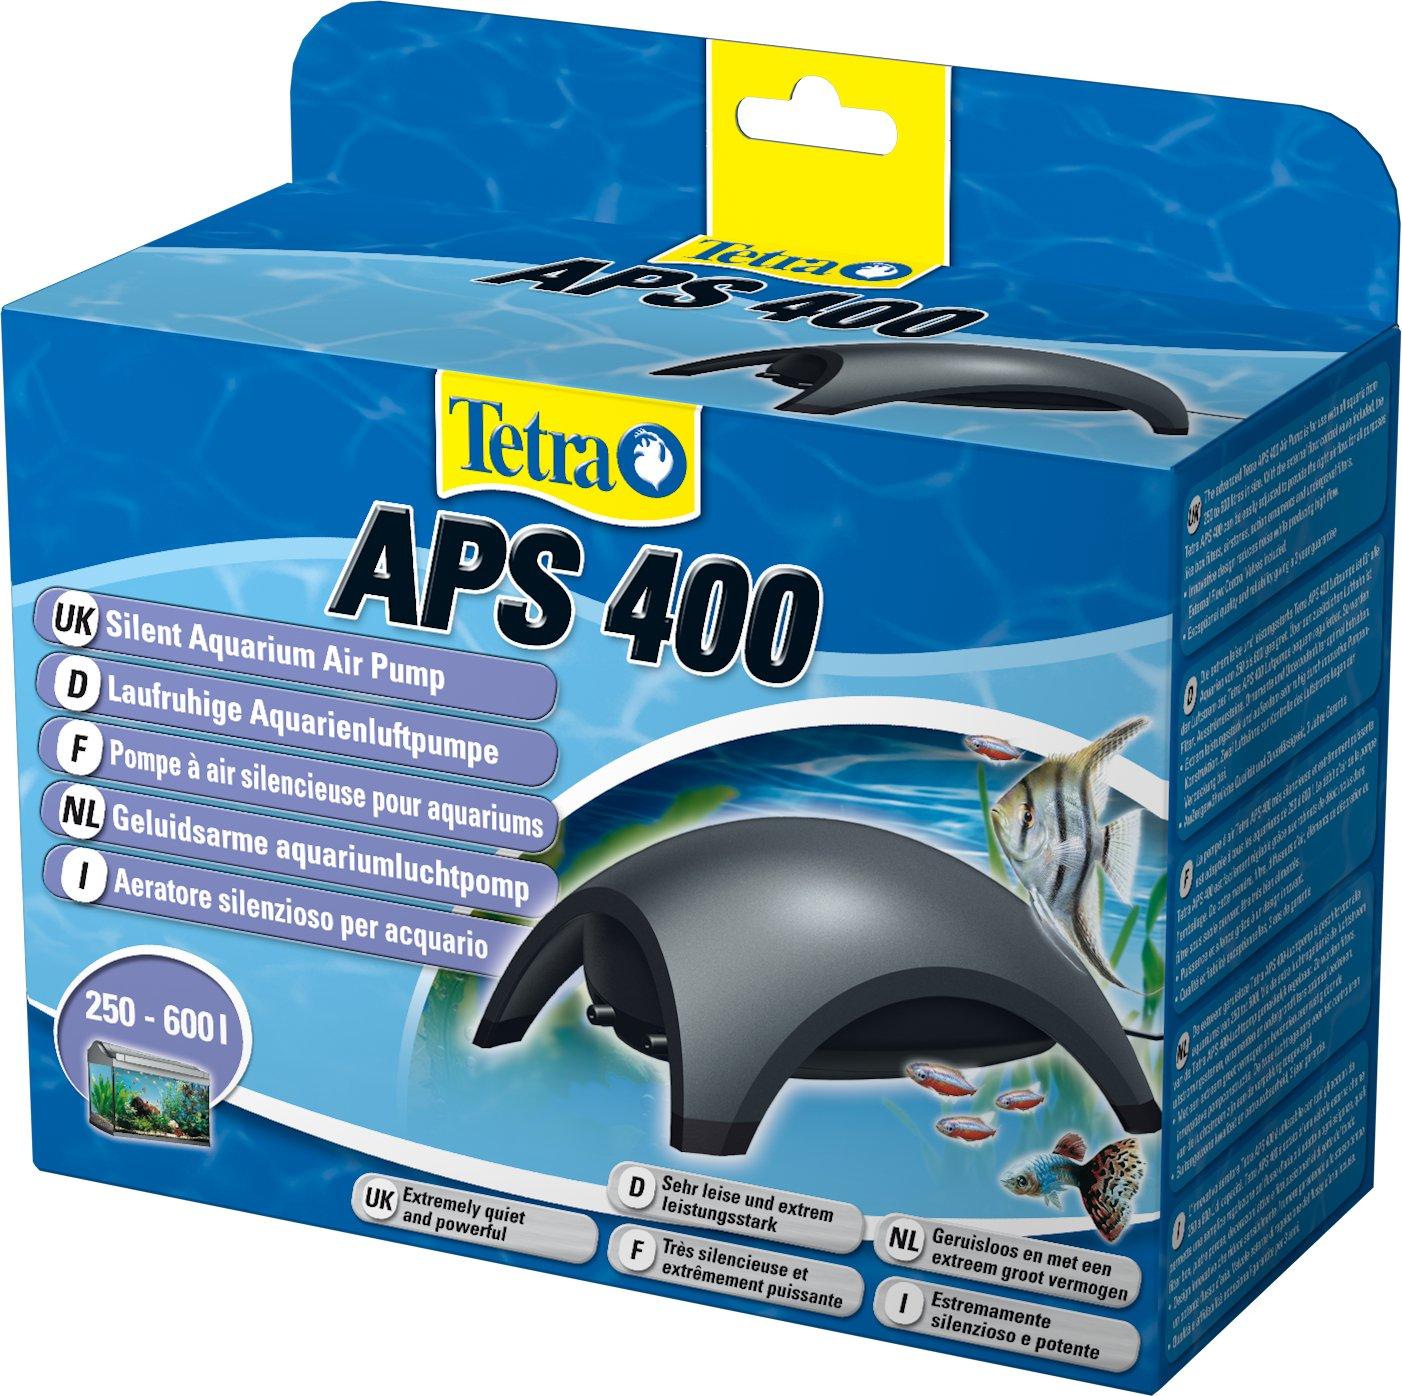 Preise TetraTec APS 400